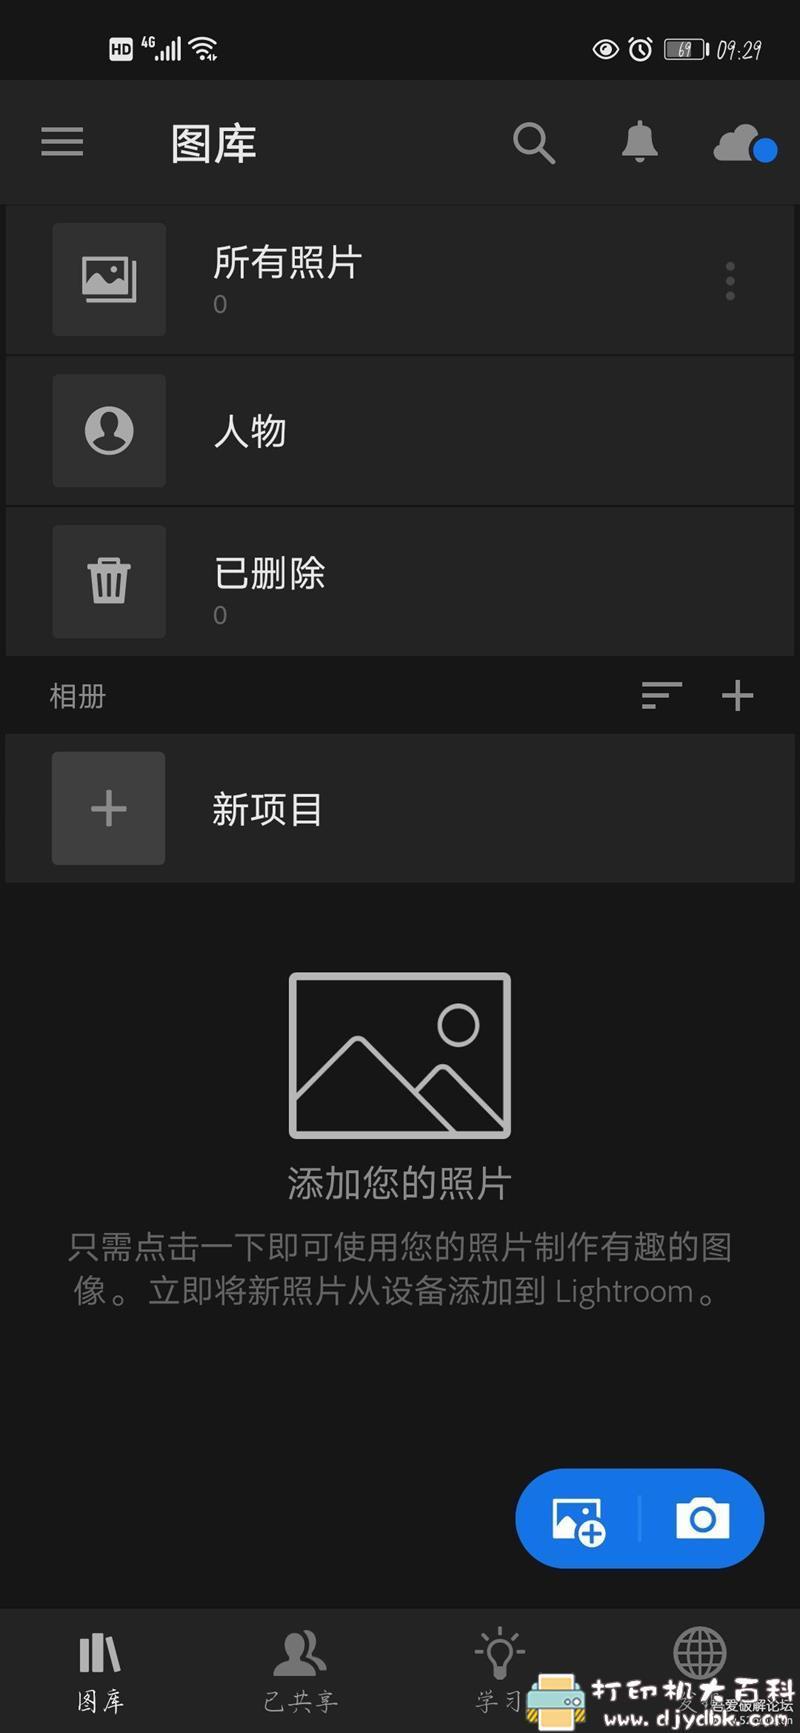 [Android]手机版PS软件 Adobe Photoshop Lightroom CC v5.3.1 for Android 直装解锁高级版 配图 No.1